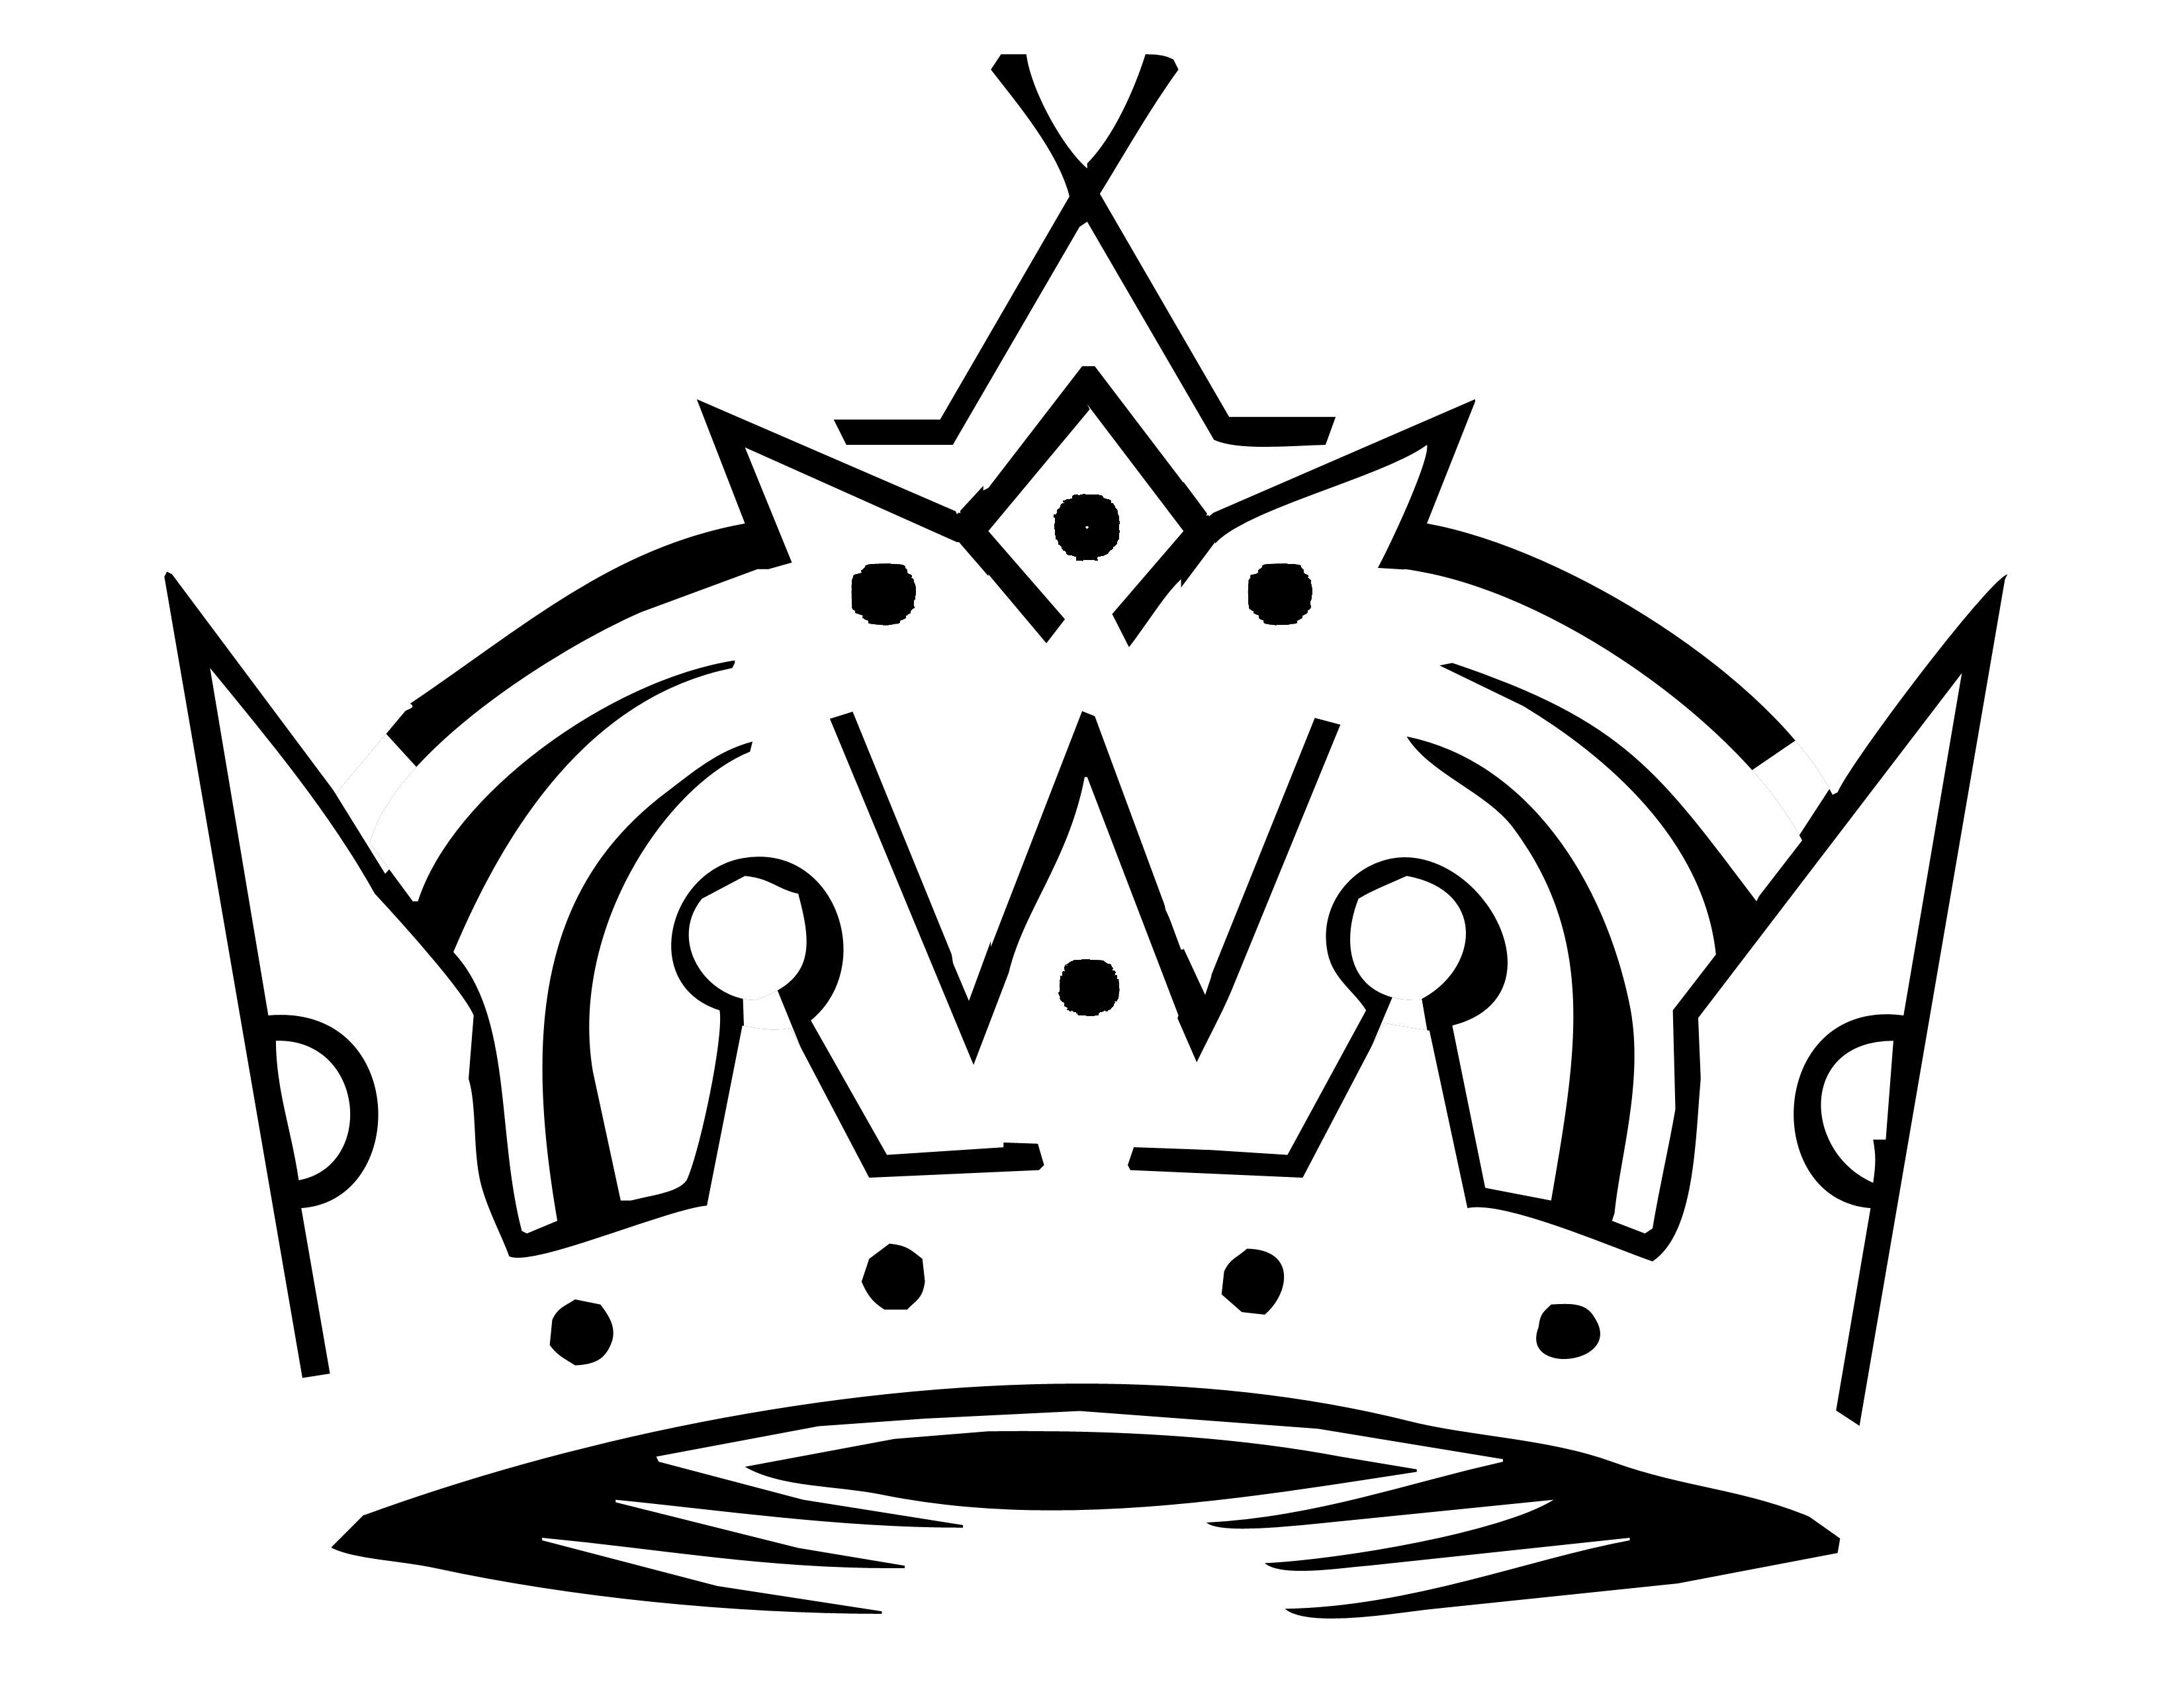 3300x2550 King Crown Coloring Page Best Of Preschool Crown Template King S